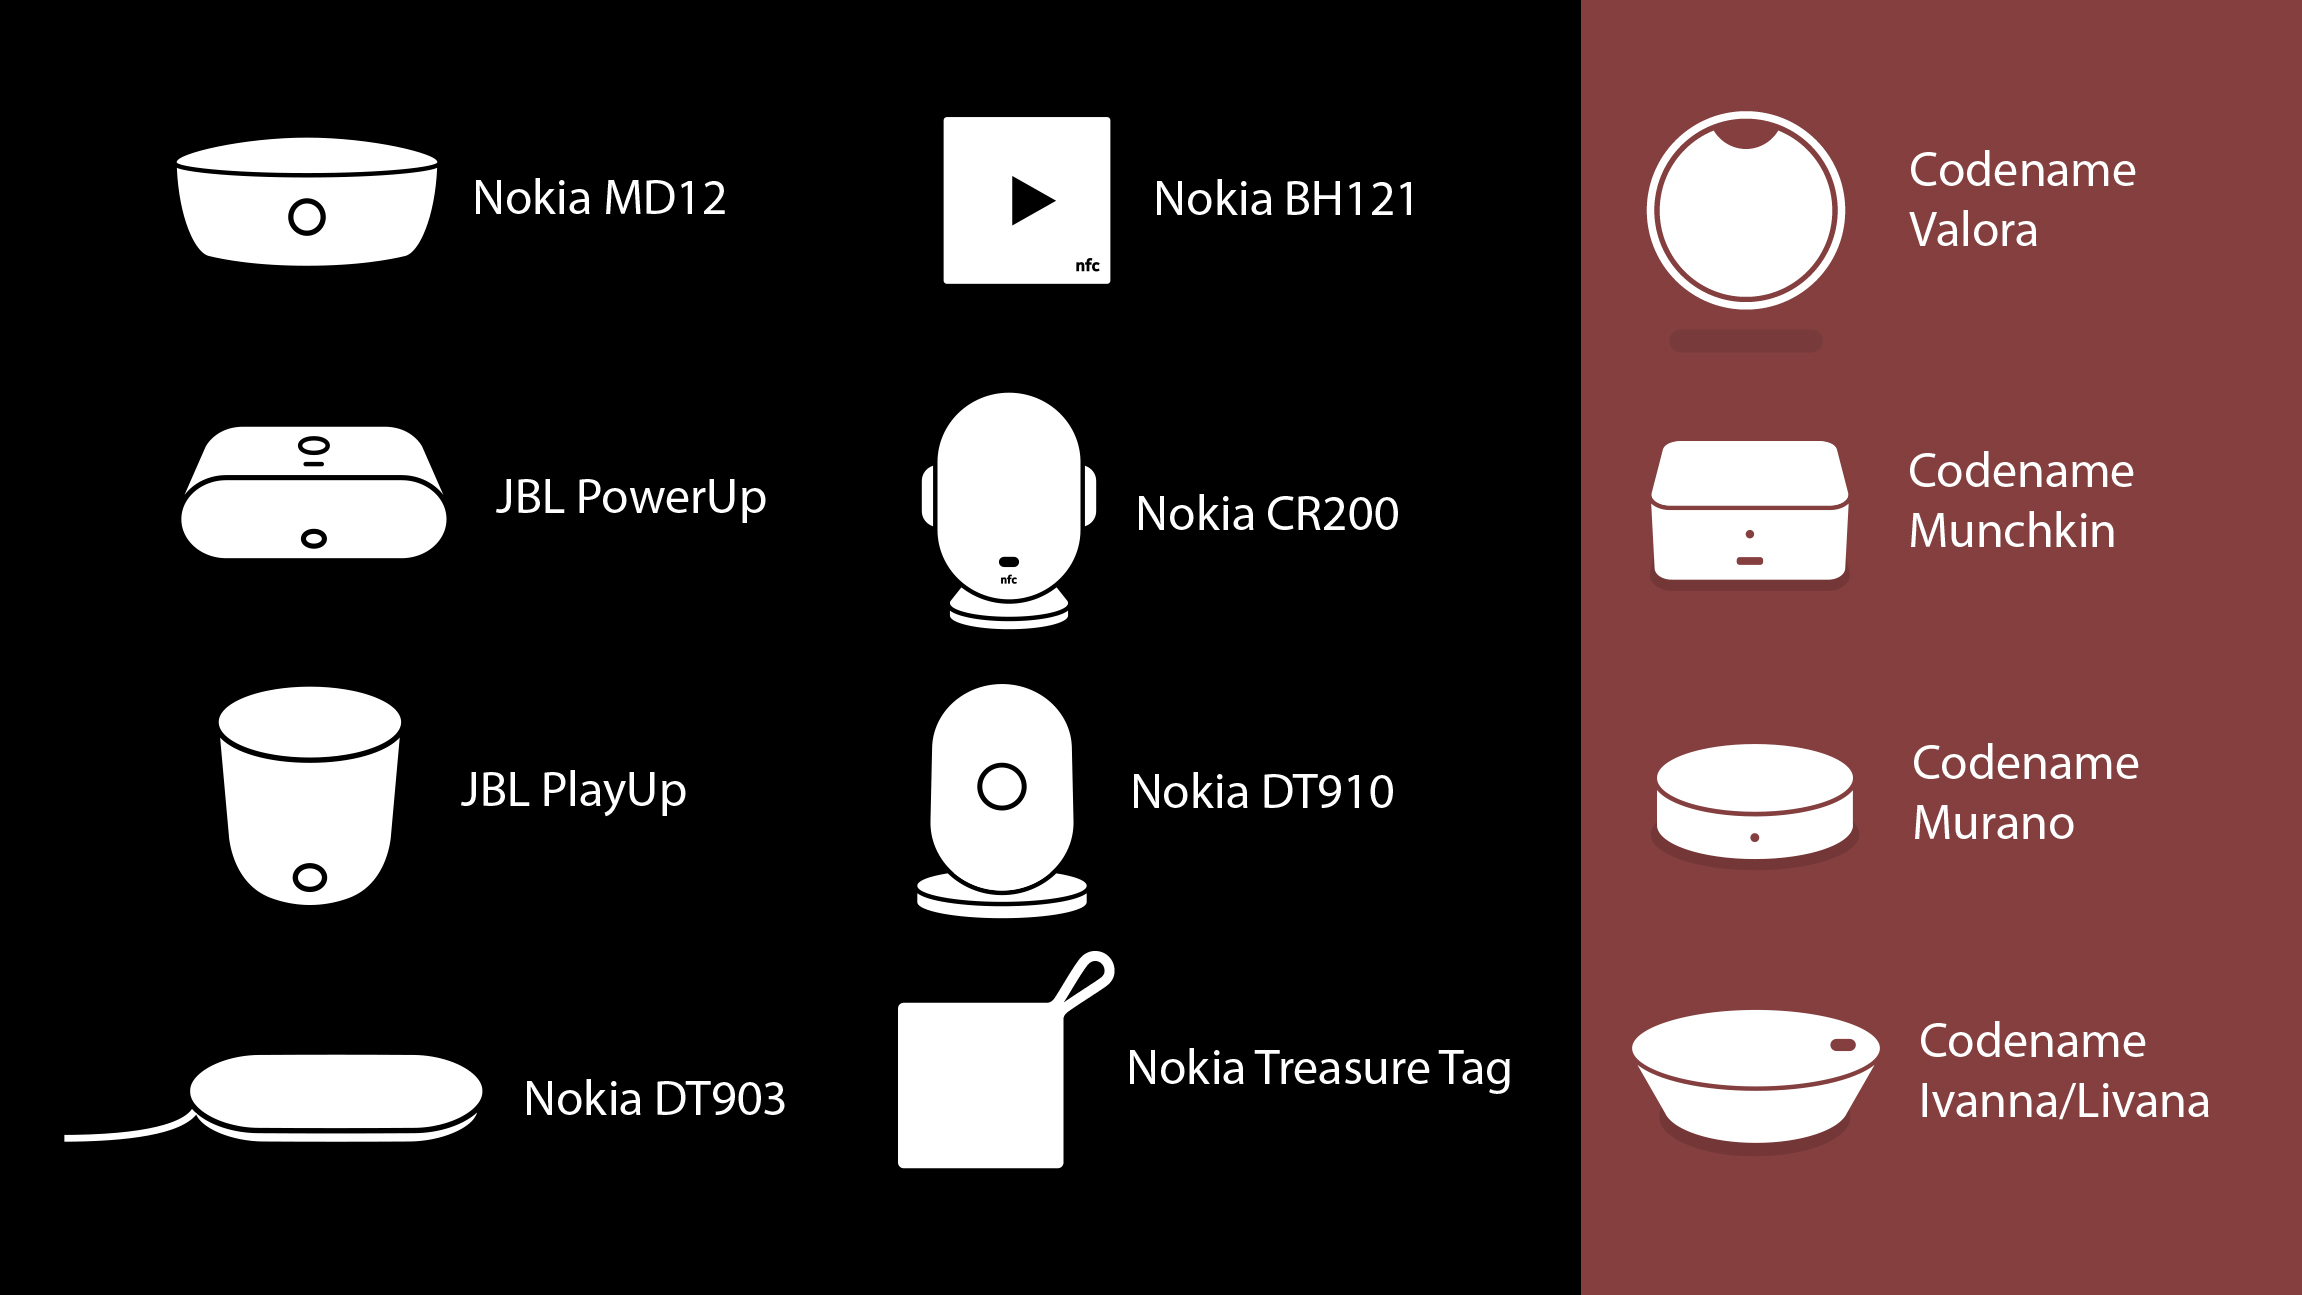 Windows 10 accessories